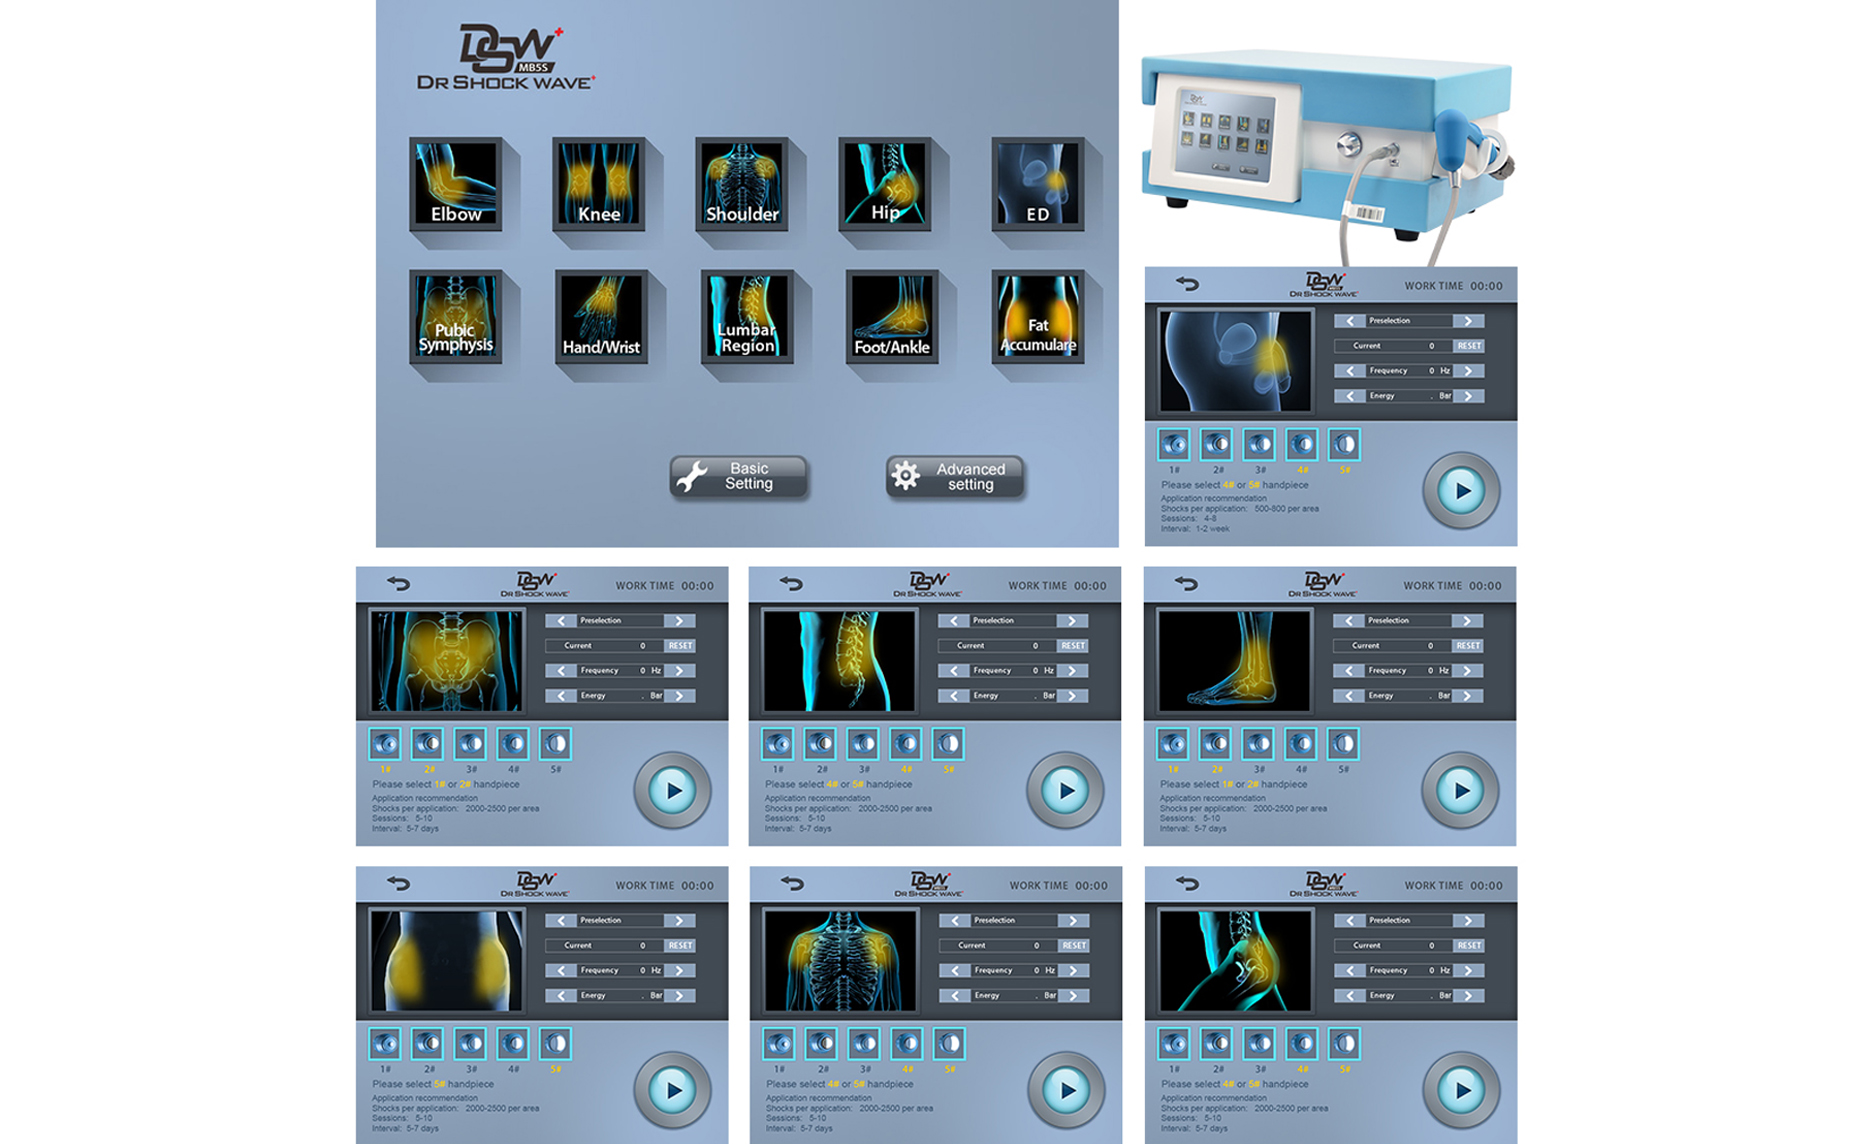 SW24 shockwave therapy machine4